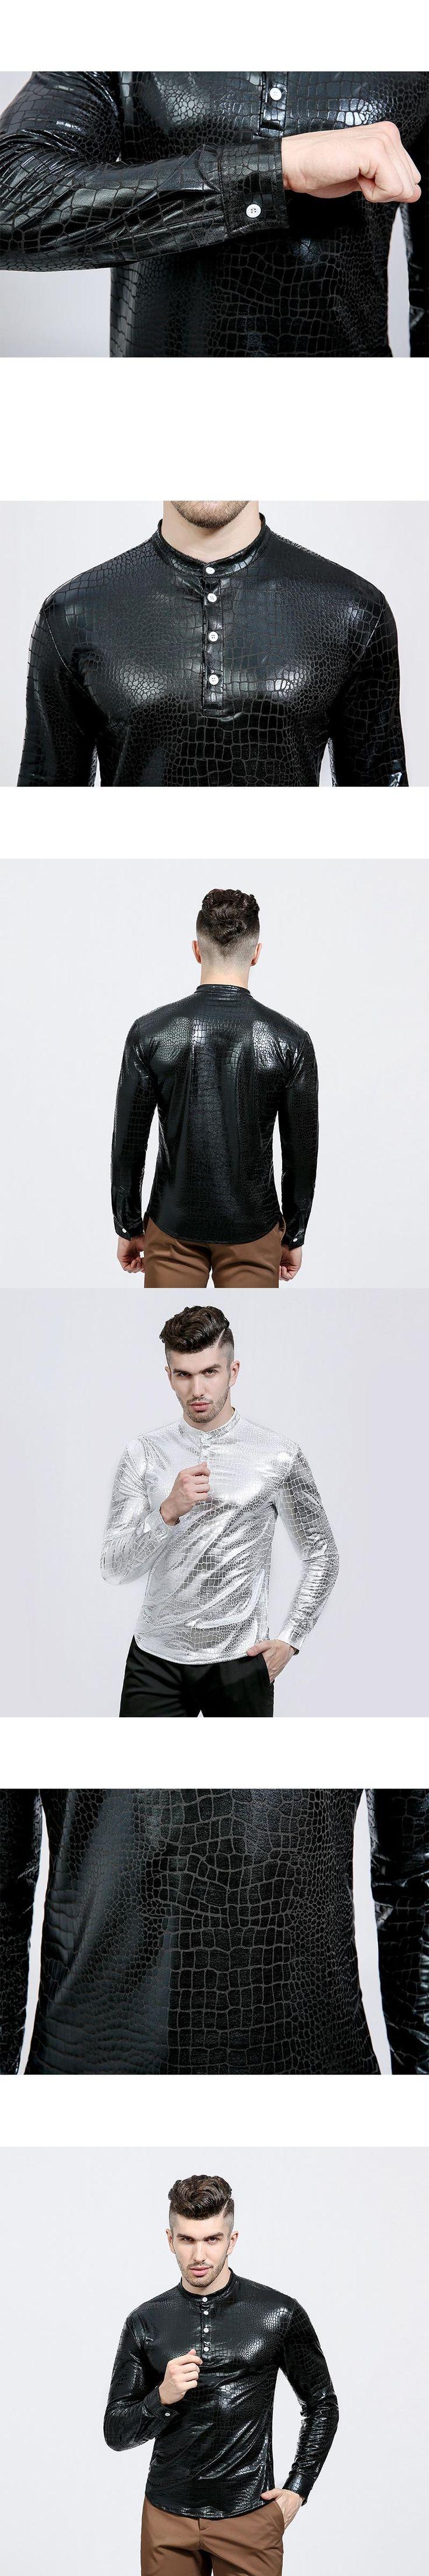 Night Club Wear Men's Elastic Shirts Slim Fit Fashion Metallic Shiny Shirt Mens Shirts Long Sleeve Chemise Homme Clothing